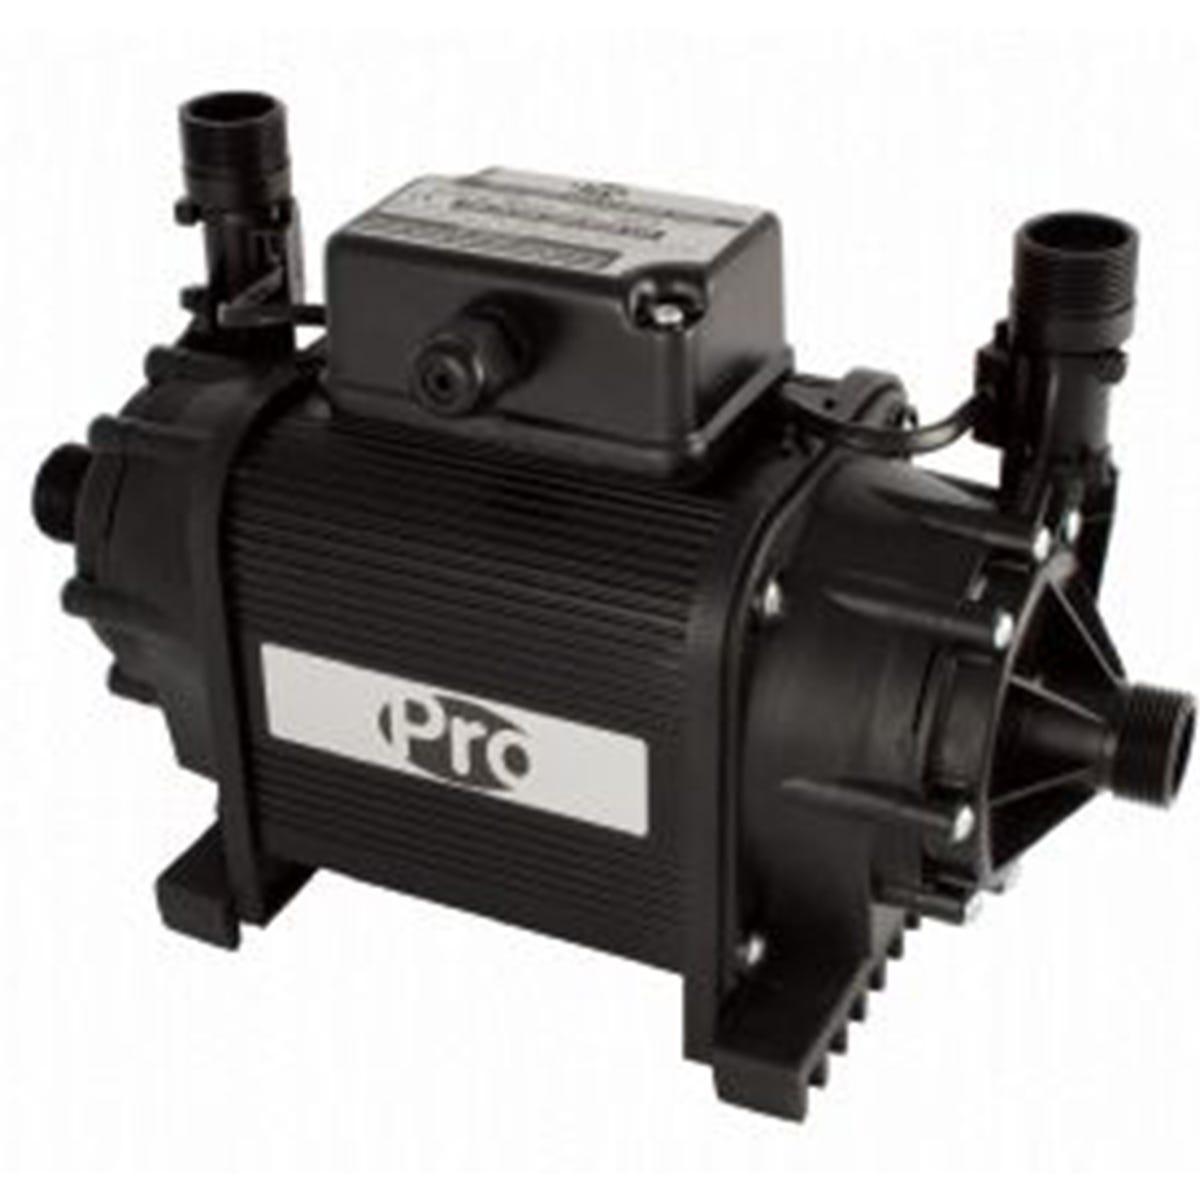 Pro 1.5 Bar Twin Impeller Centrifugal Shower Pump